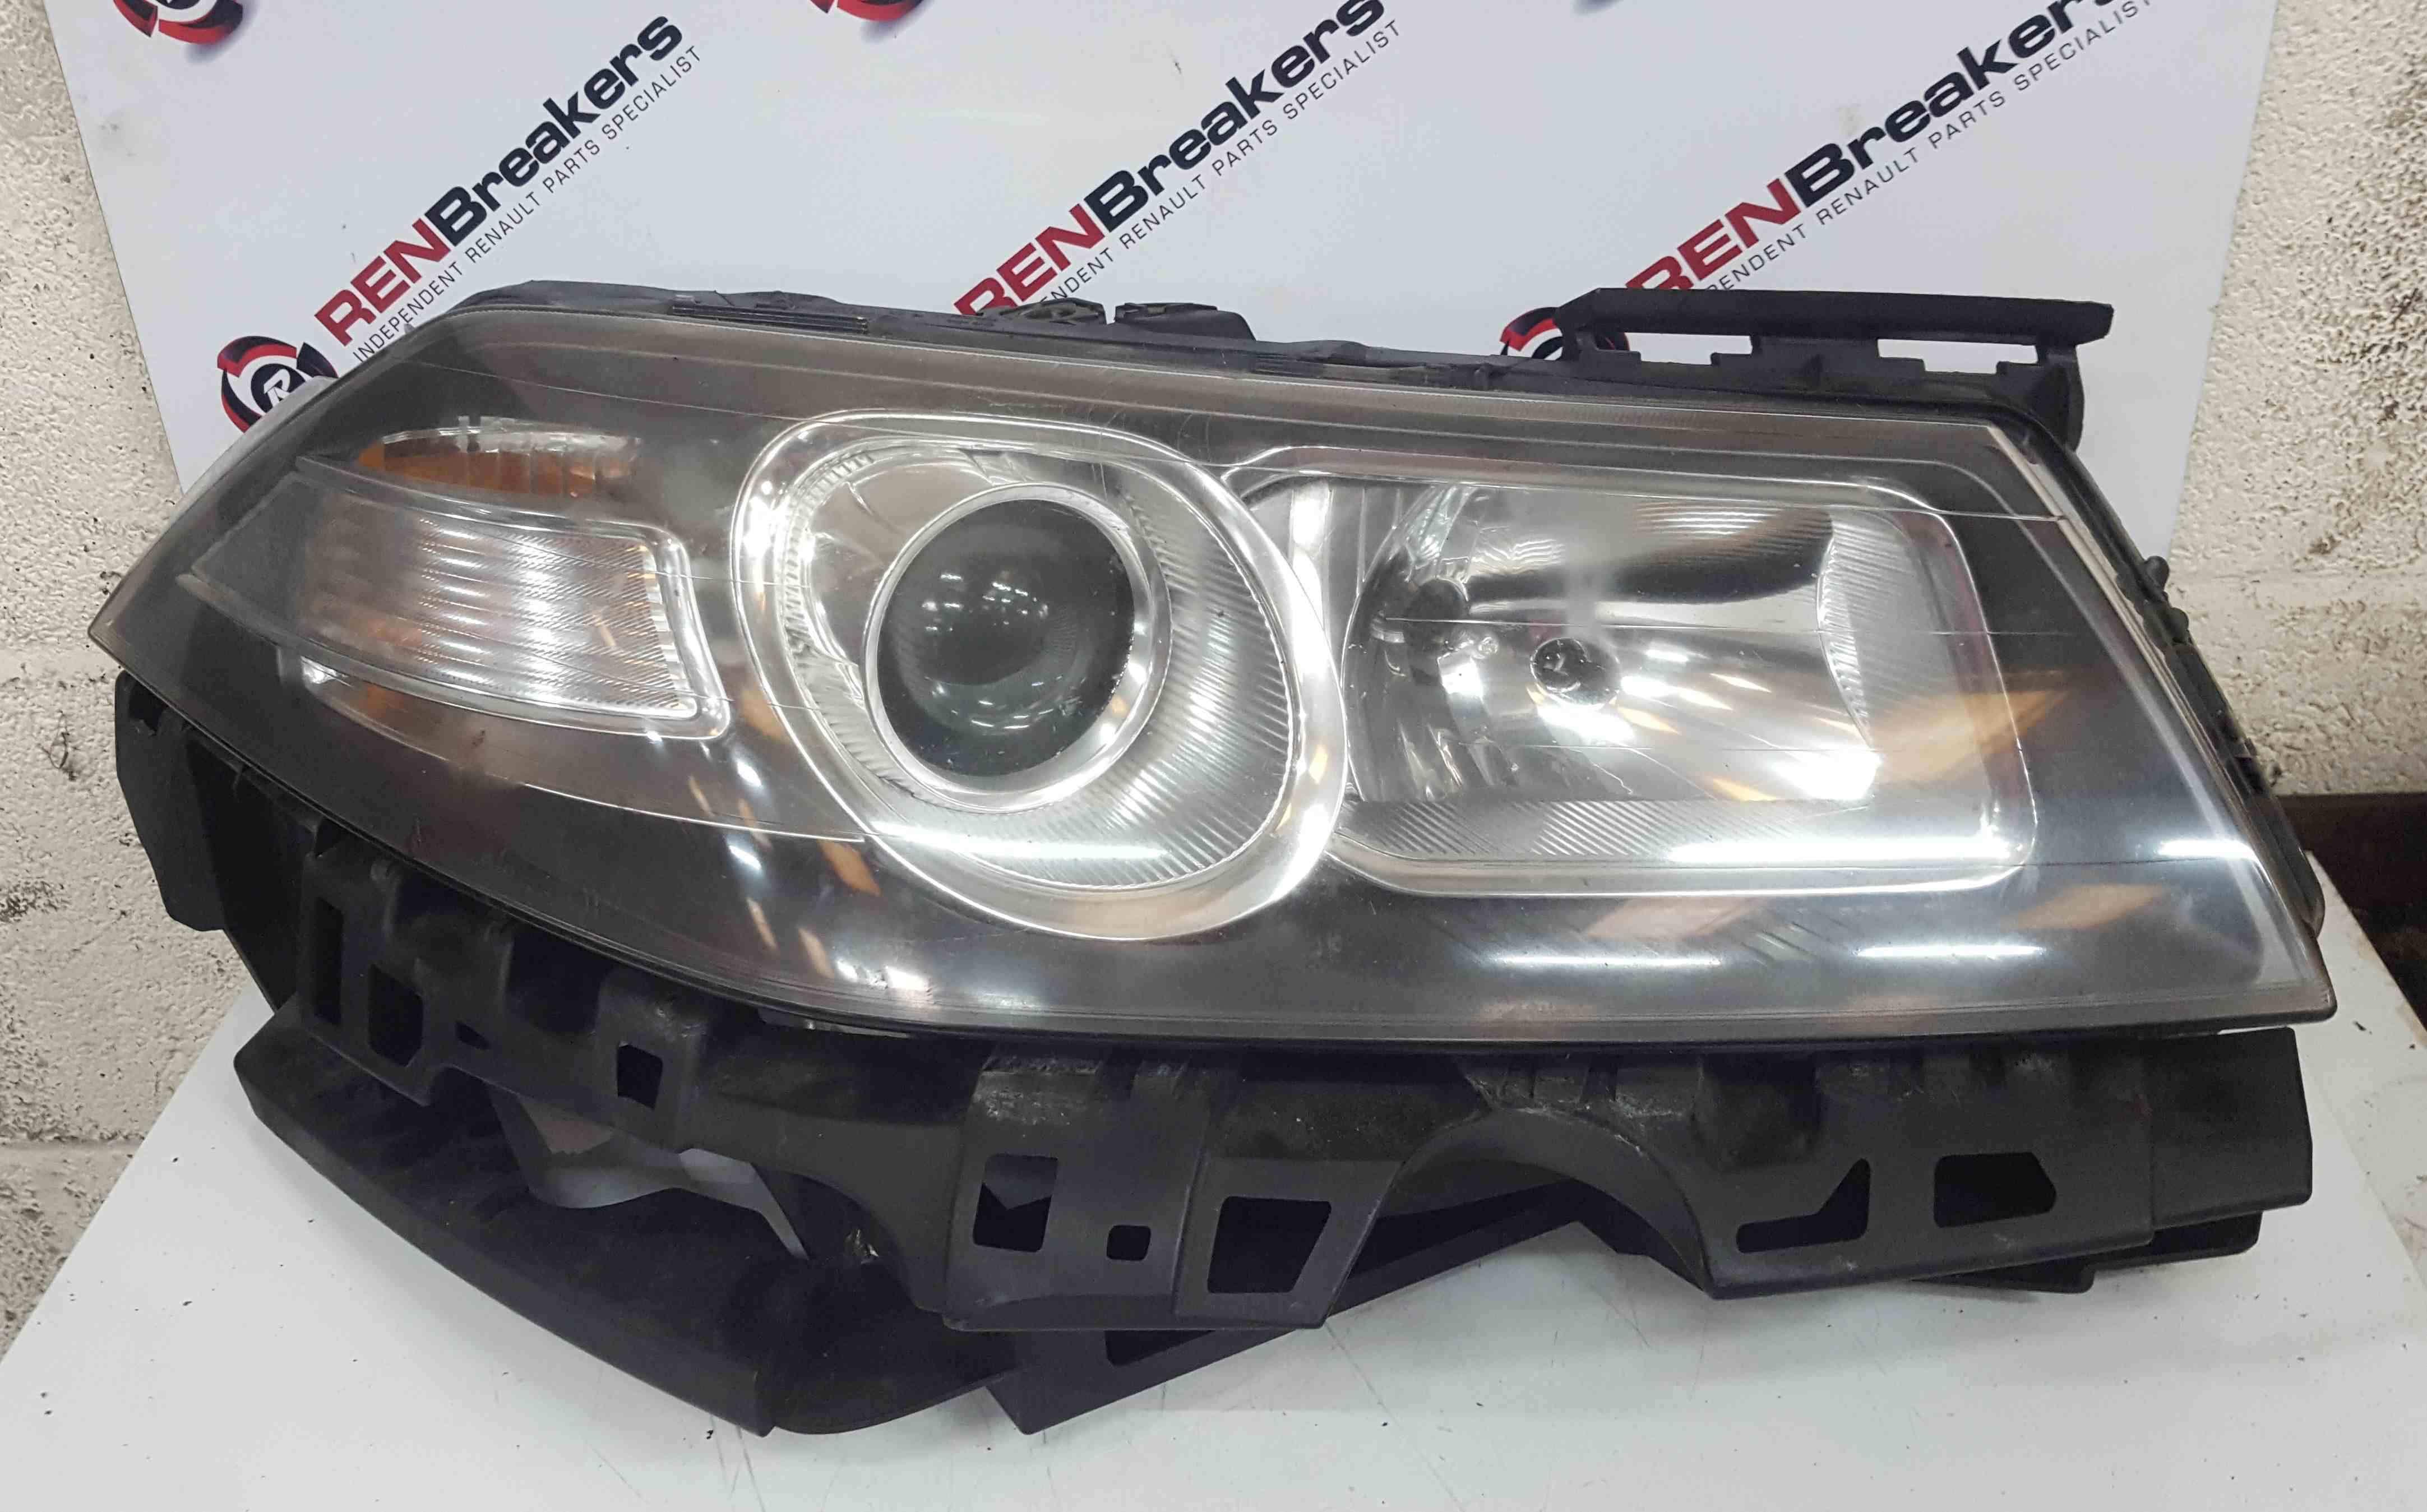 Renault Megane 2006-2008 Drivers OSF Front Headlight Black Backing 7701067023